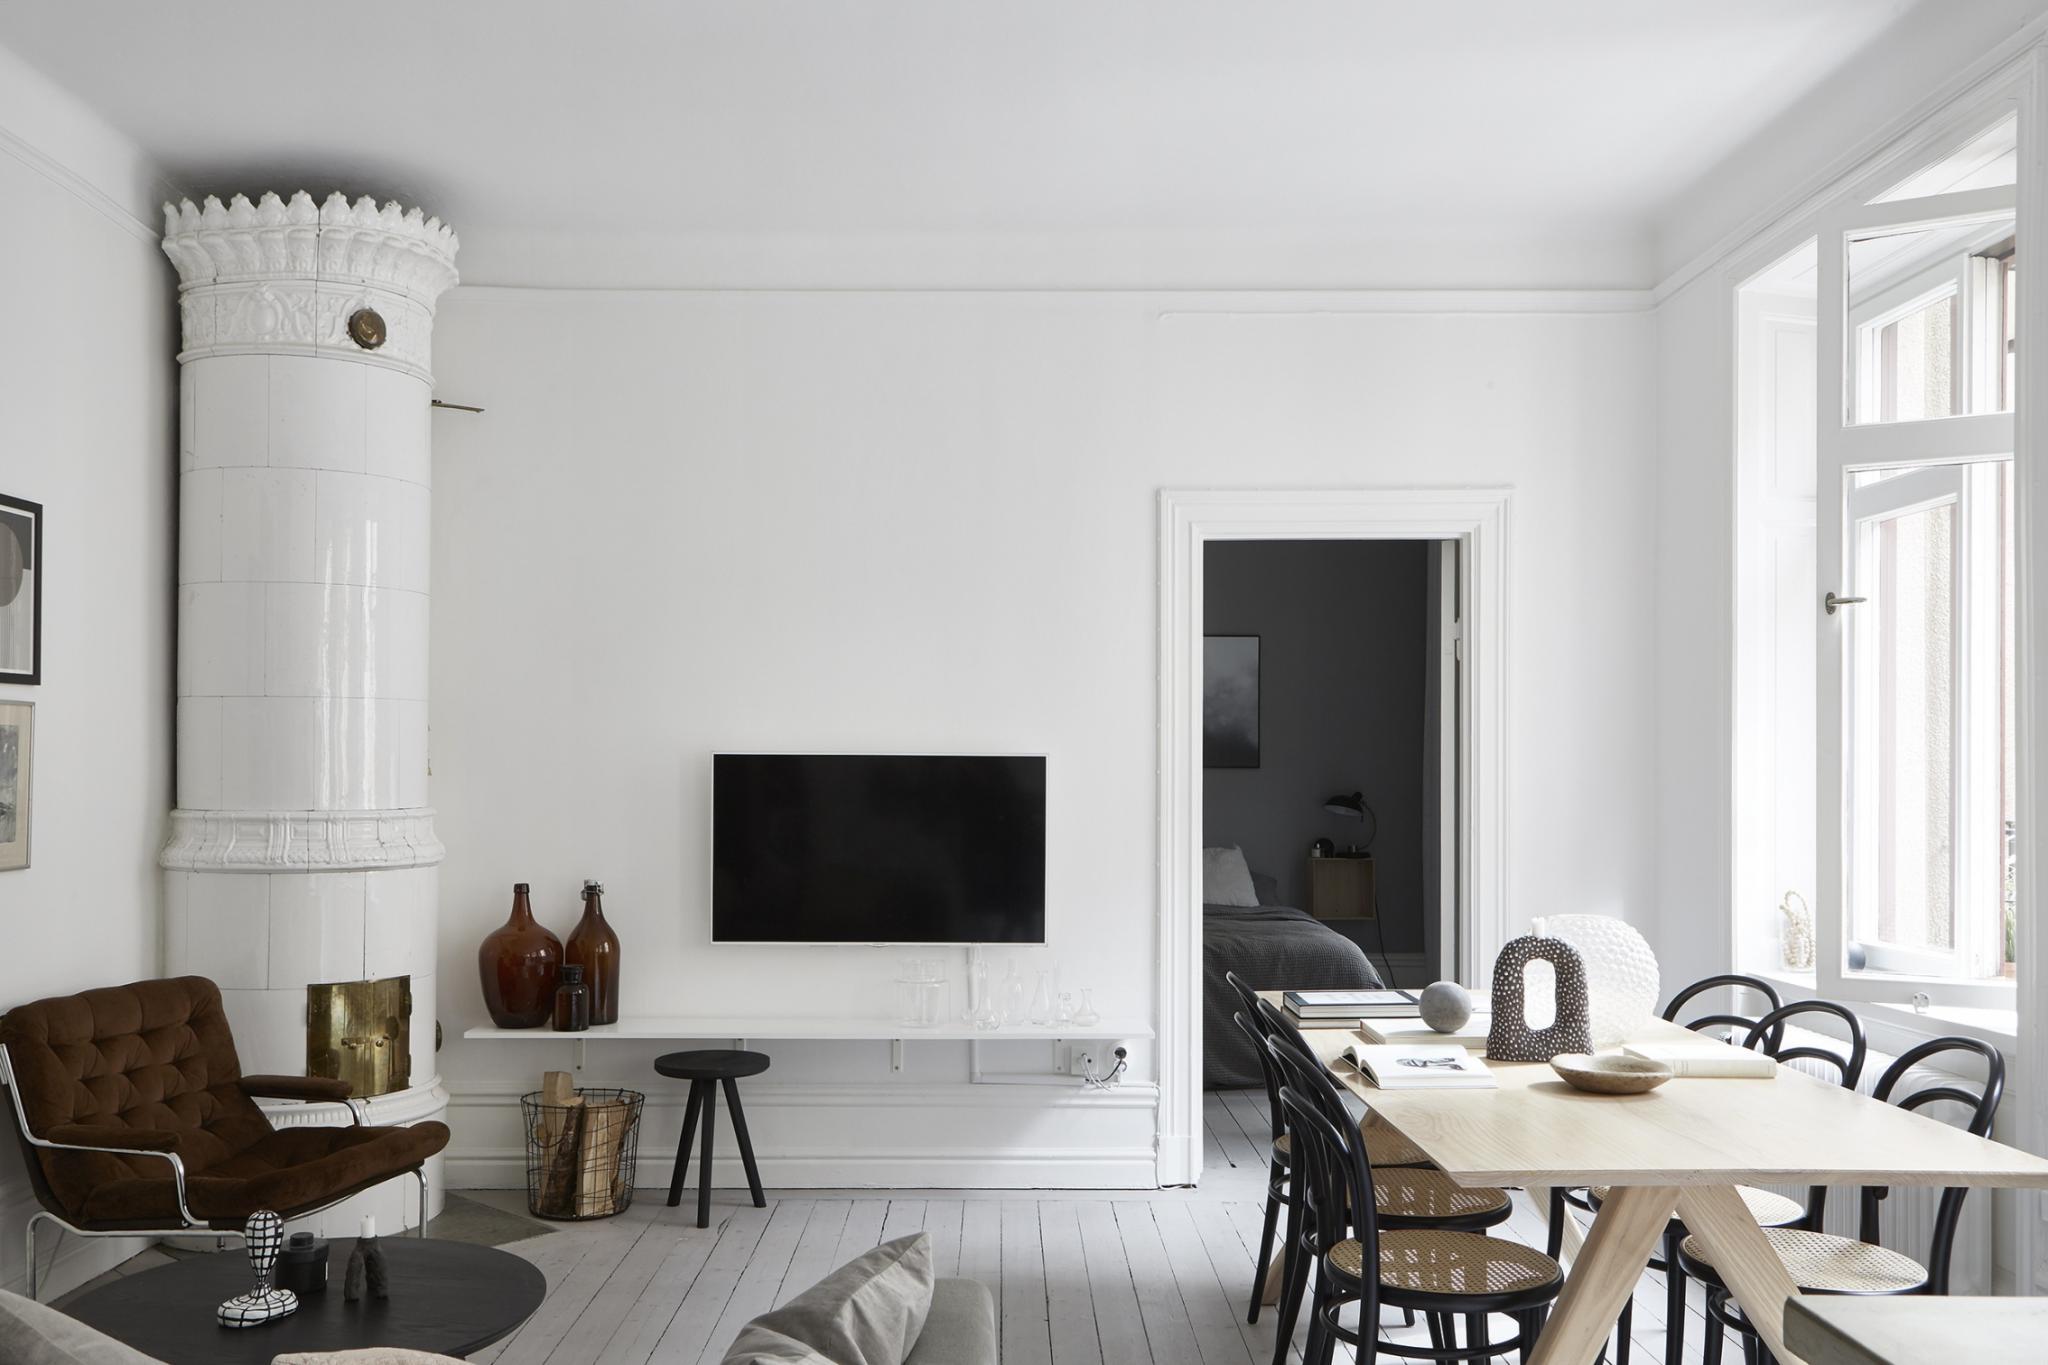 Stylish home in natural colors COCO LAPINE DESIGNCOCO LAPINE DESIGN